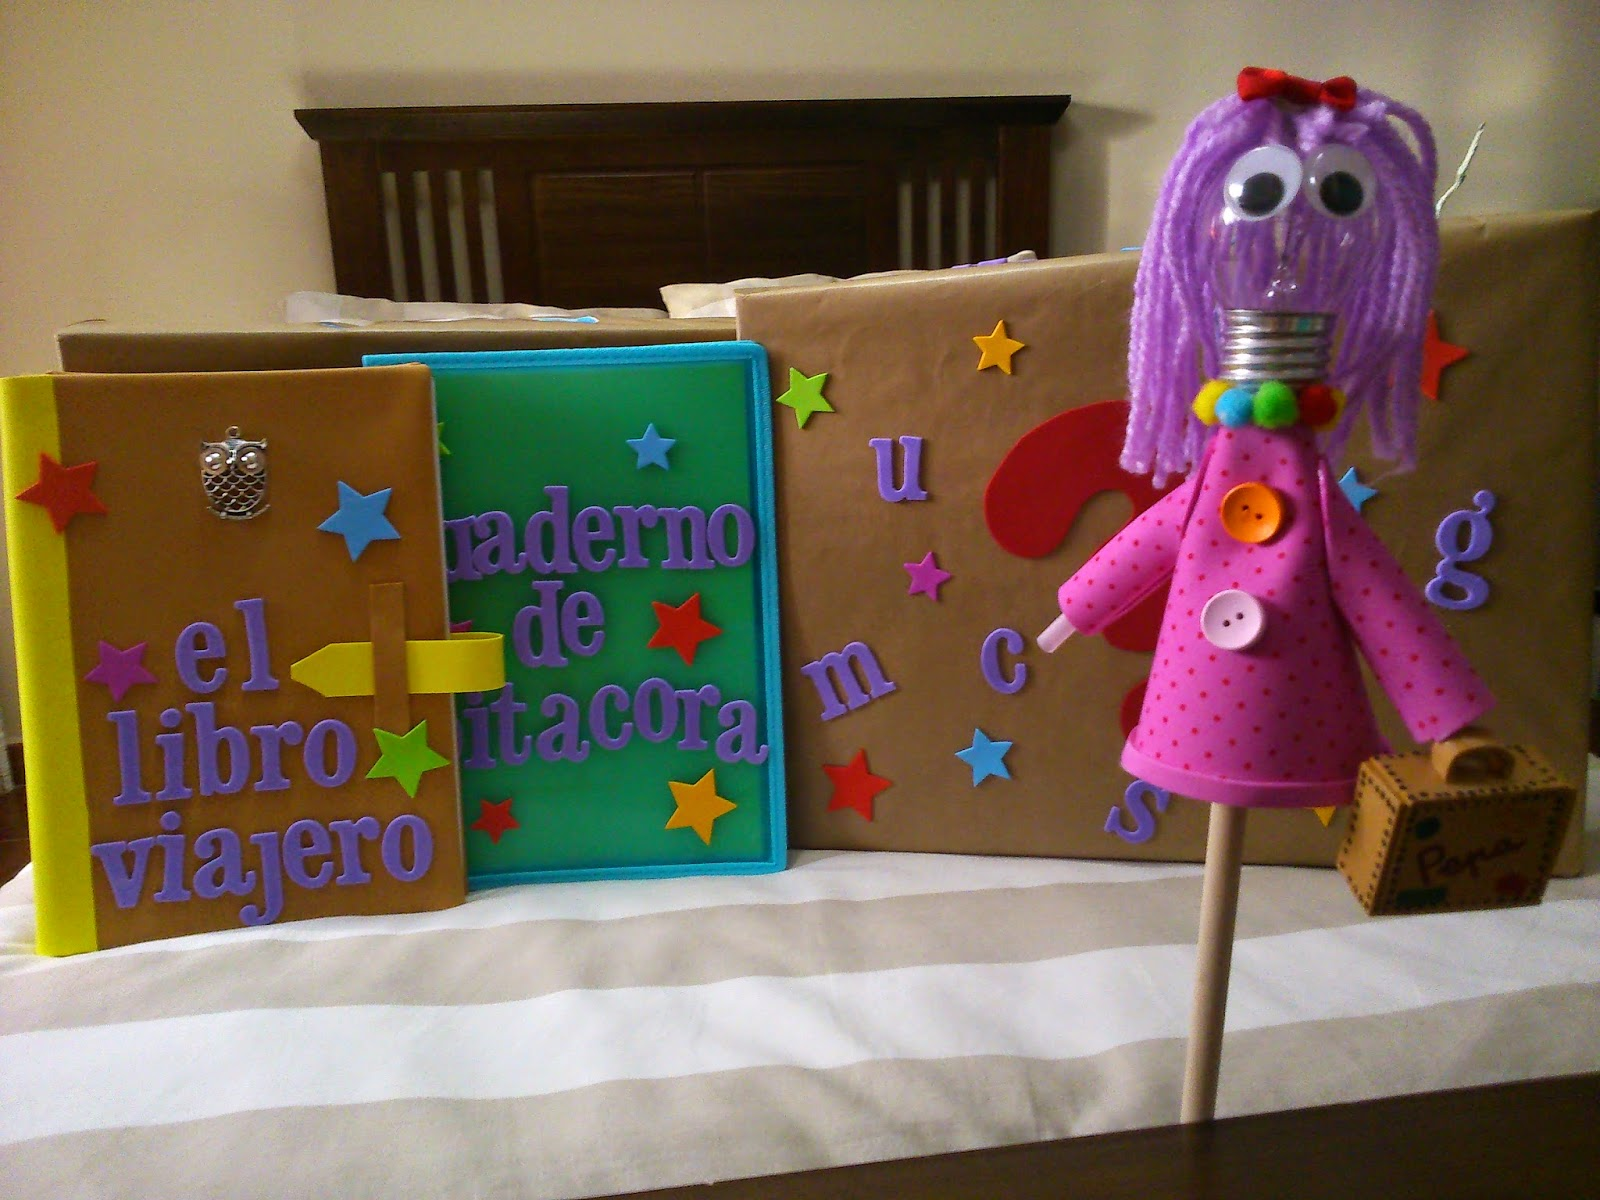 Libreta Viajera Infantil Para Imprimir: * MÓN INFANTIL* Y Ciclo Inicial: PARTICIPAMOS EN EL